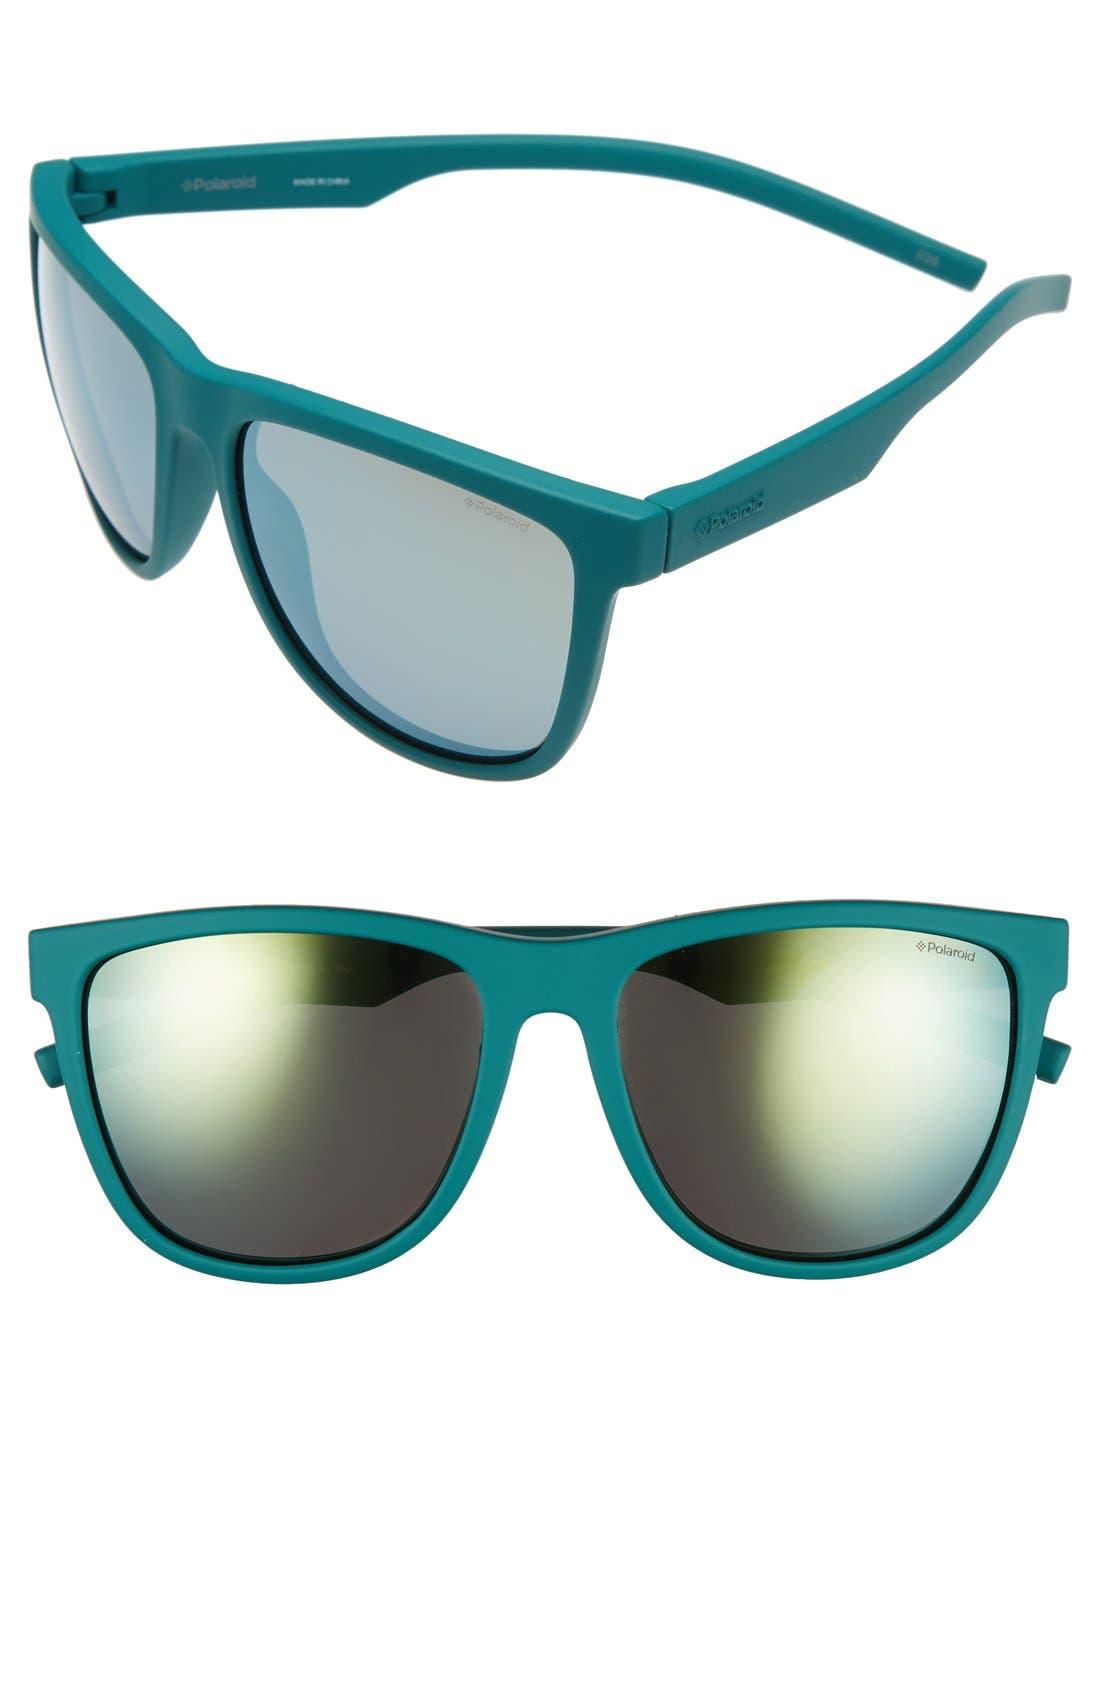 56mm Retro Polarized Sunglasses,                             Main thumbnail 1, color,                             Green/ Grey Gold Mirror